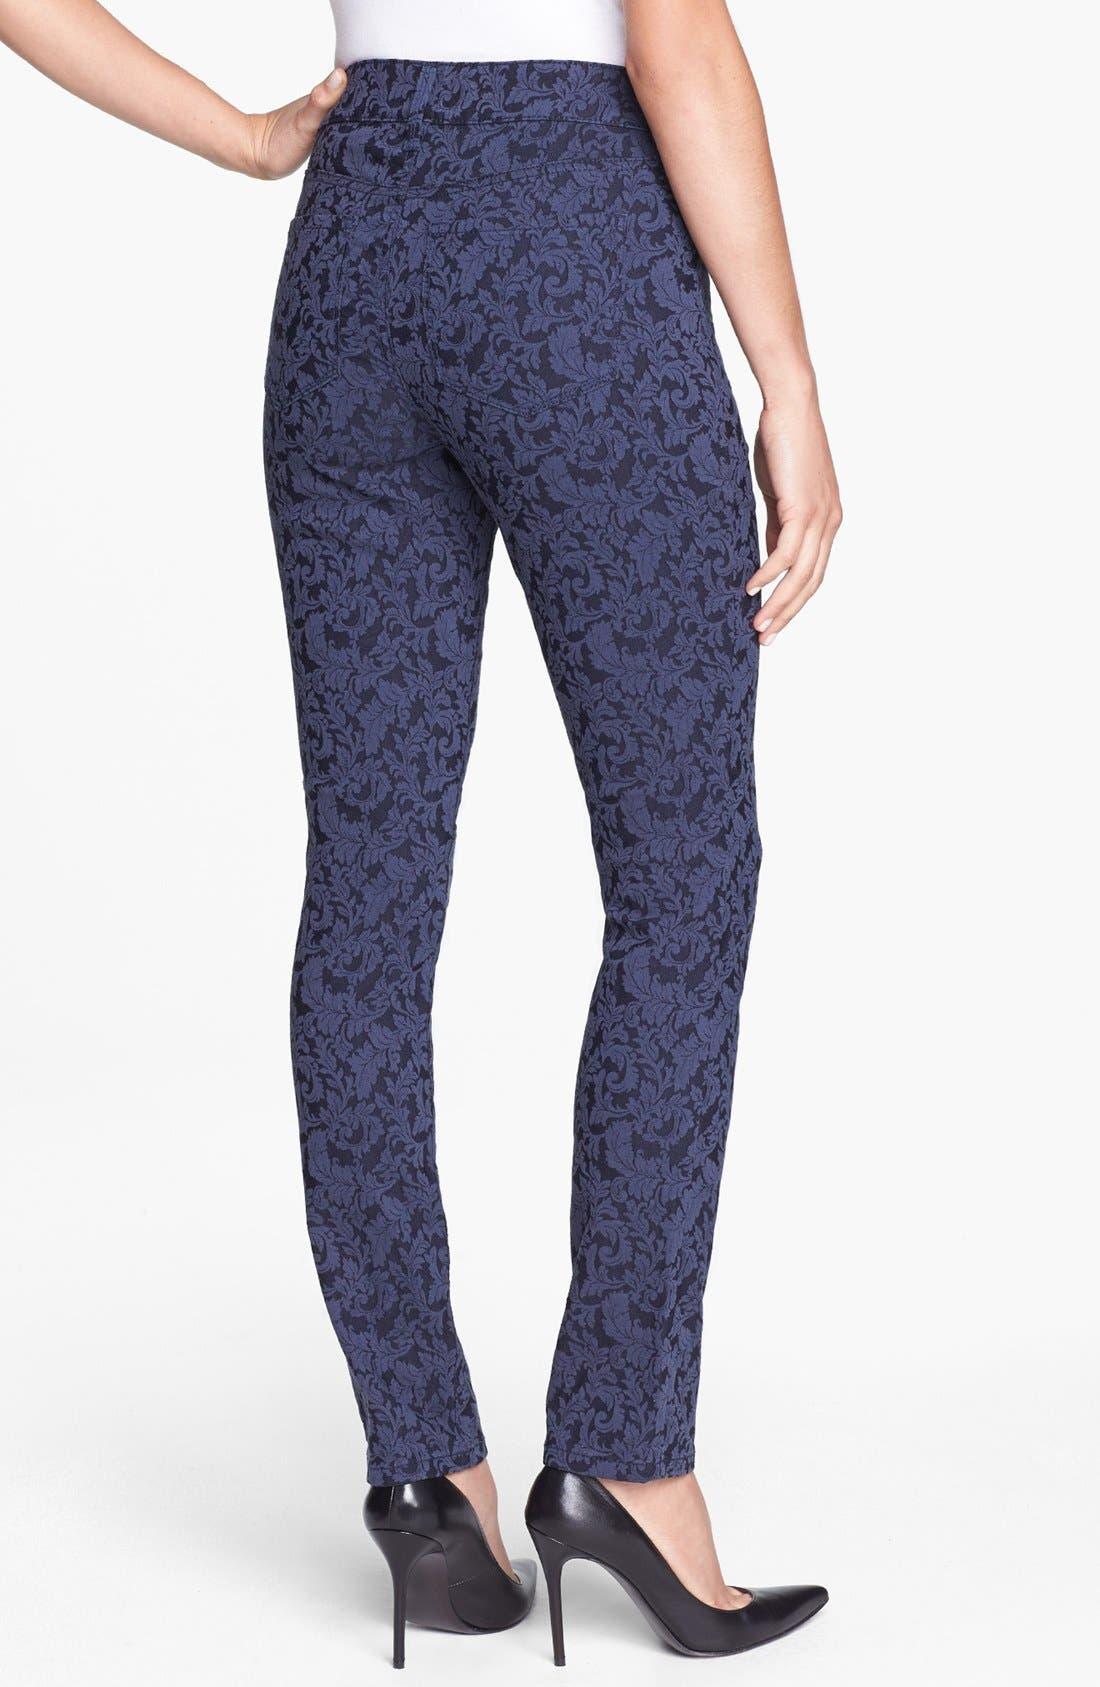 Alternate Image 2  - NYDJ 'Jade' Patterned Stretch Skinny Jeans (Navy Jacquard)